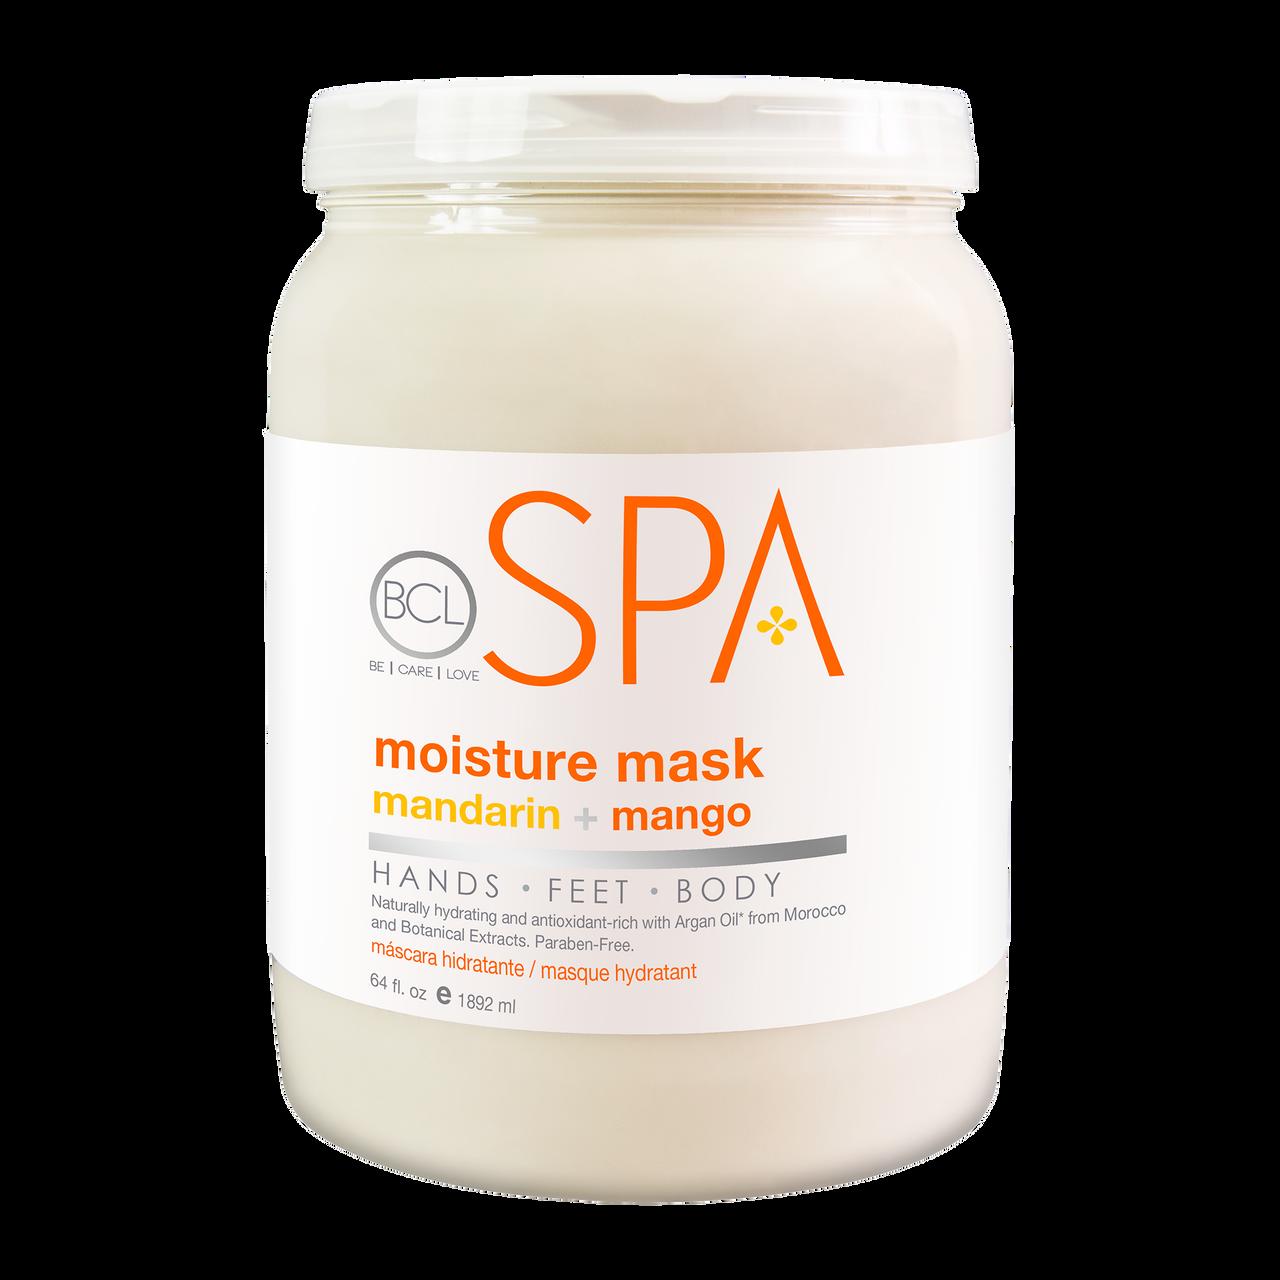 BCL SPA 64 oz. Moisture Mask Mandarin + Mango